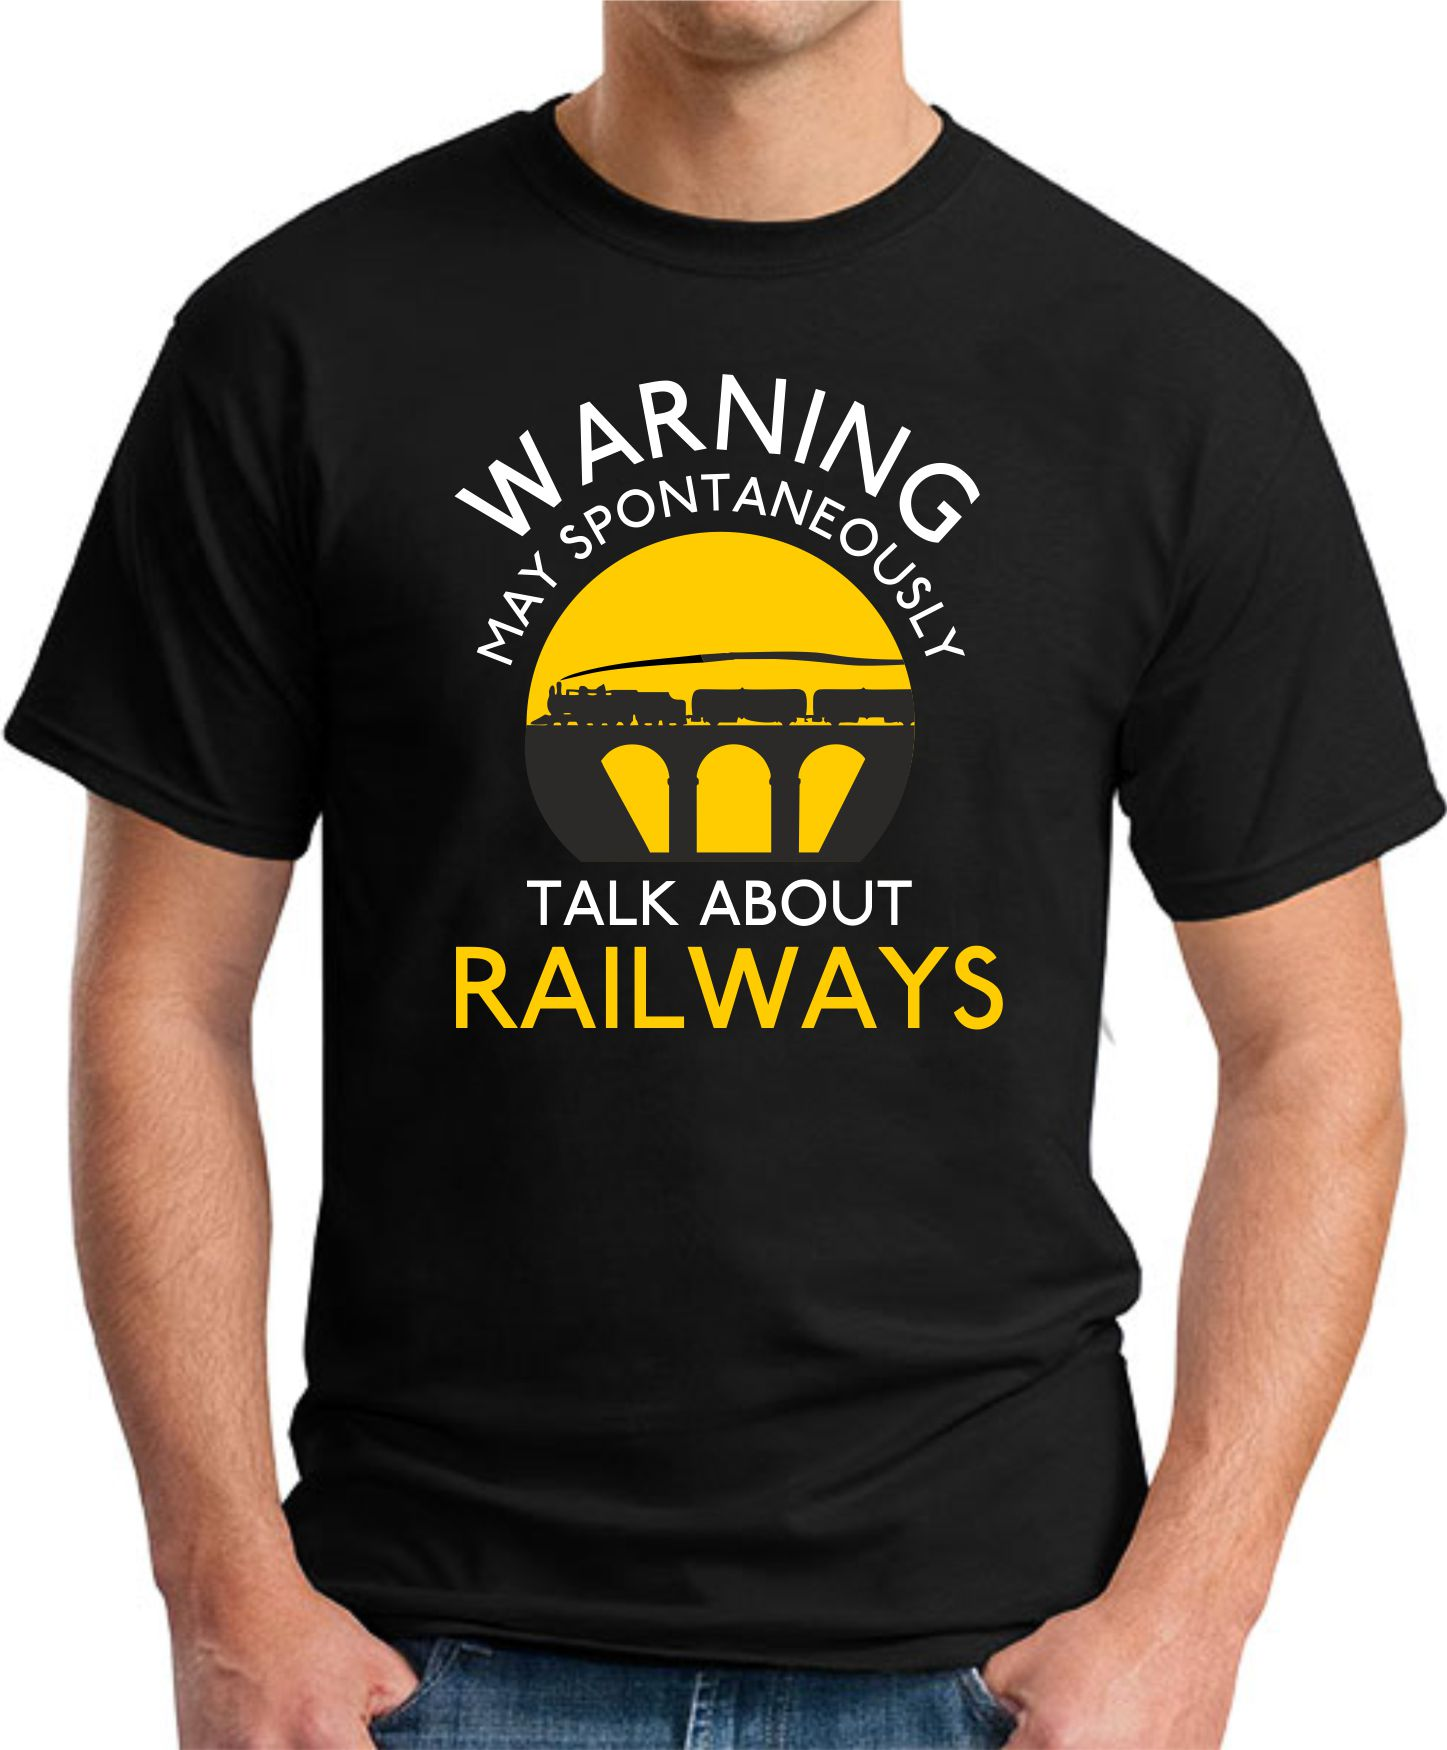 WARNING MAY SPONTANEOUSLY TALK ABOUT RAILWAYS black